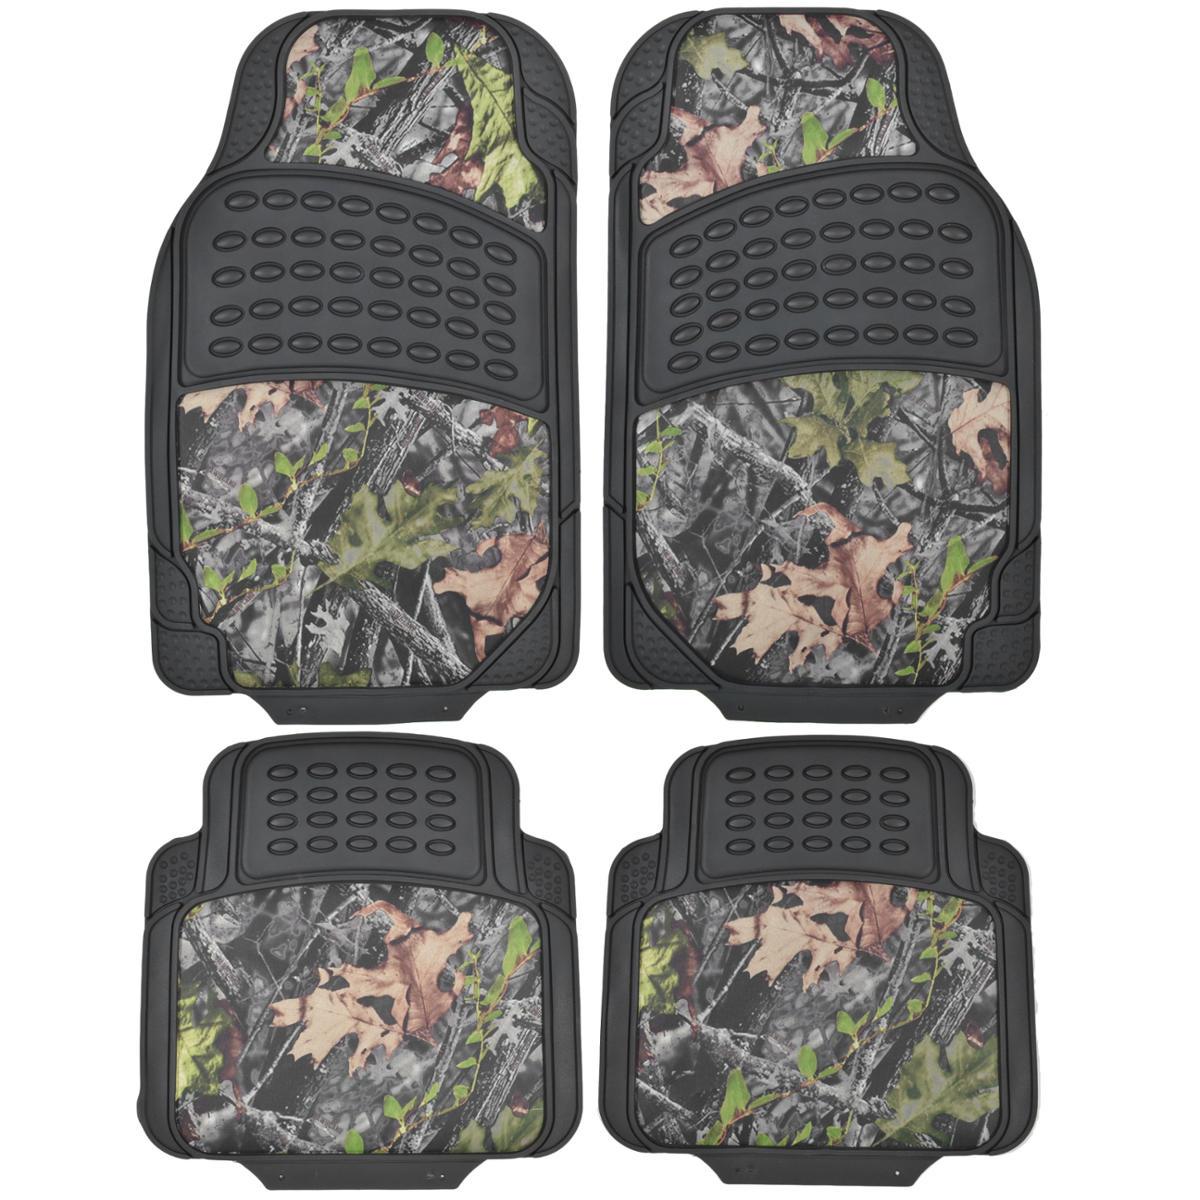 Rubber floor mats acura rdx - 4 Piece Two Tone Camo Rubber Floor Mats All Weather Waterproof Protection